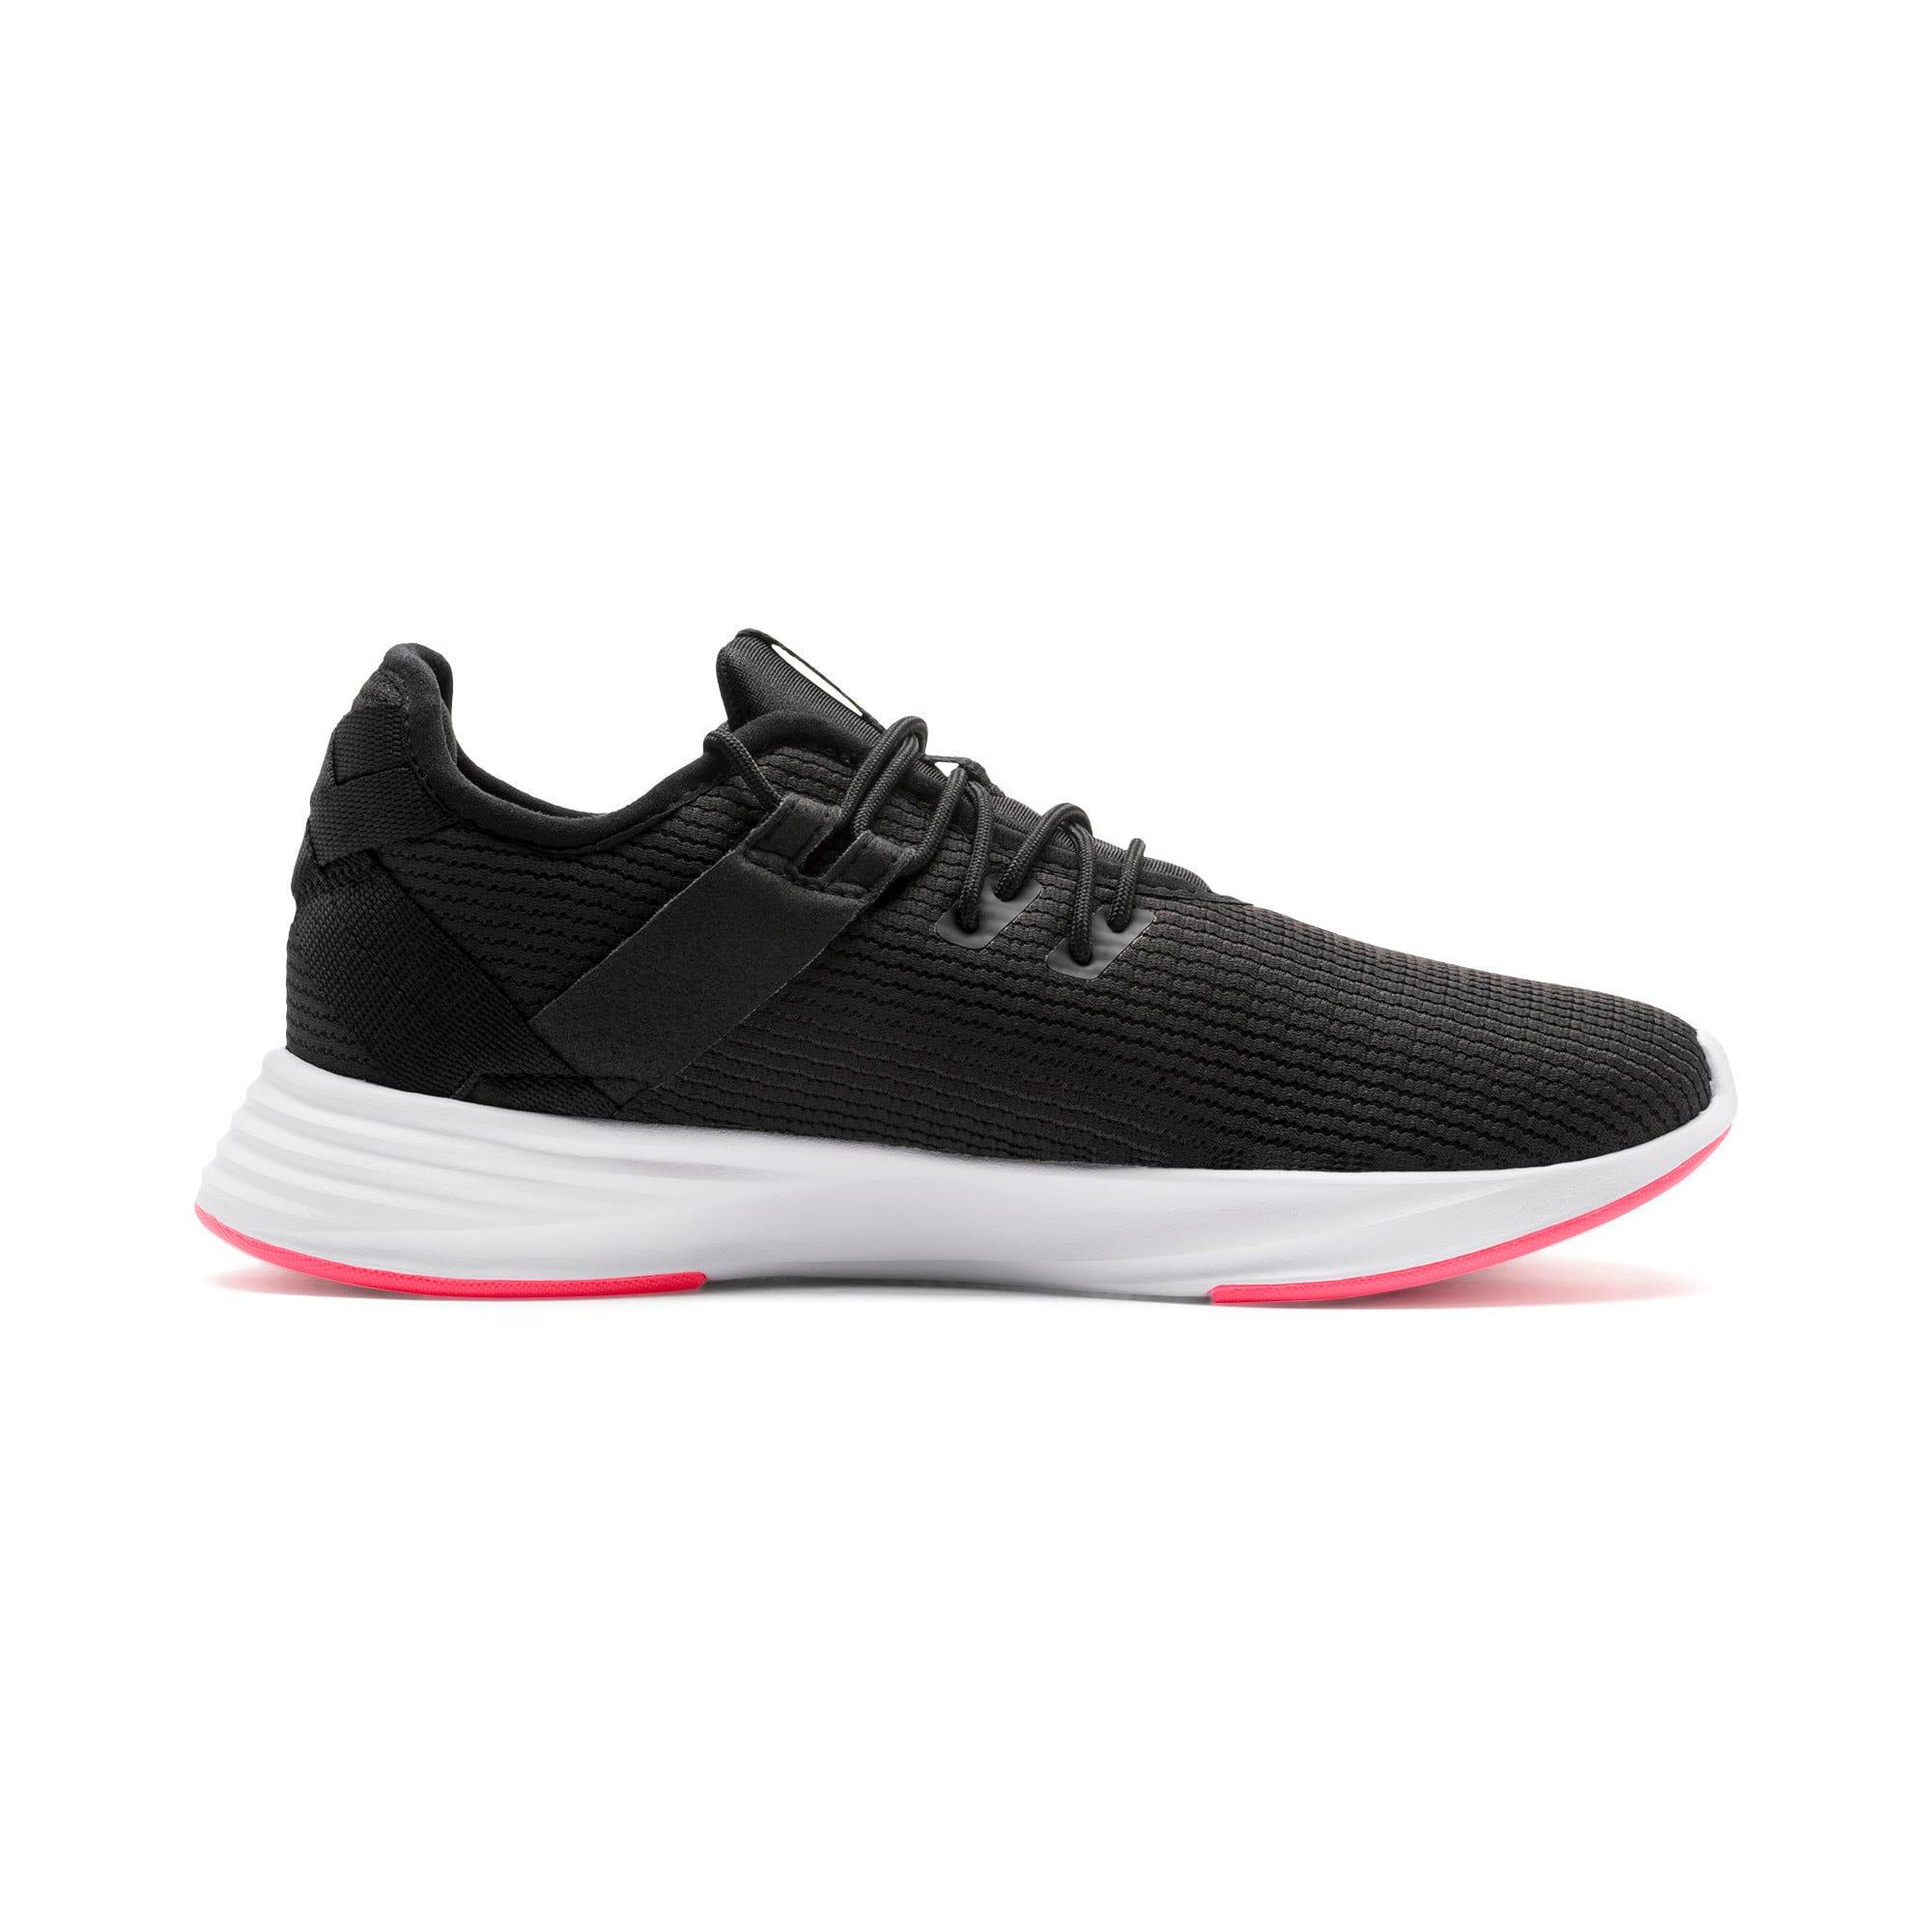 Thumbnail 6 of Radiate XT Women's Training Shoes, Puma Black-Pink Alert, medium